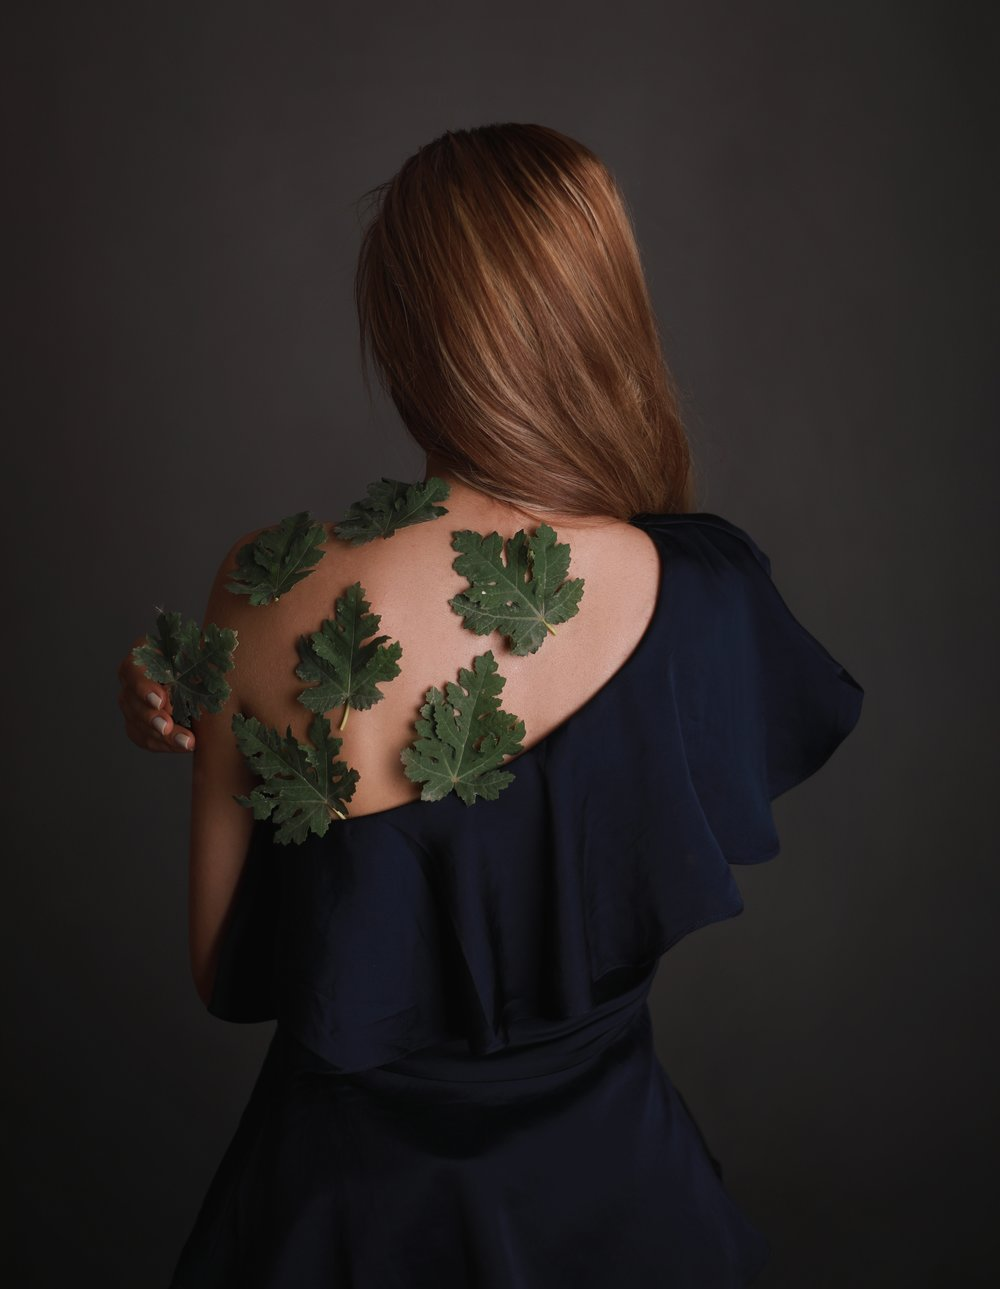 Plants made my back feel better.  Photo by  Zohre Nemati on  Unsplash